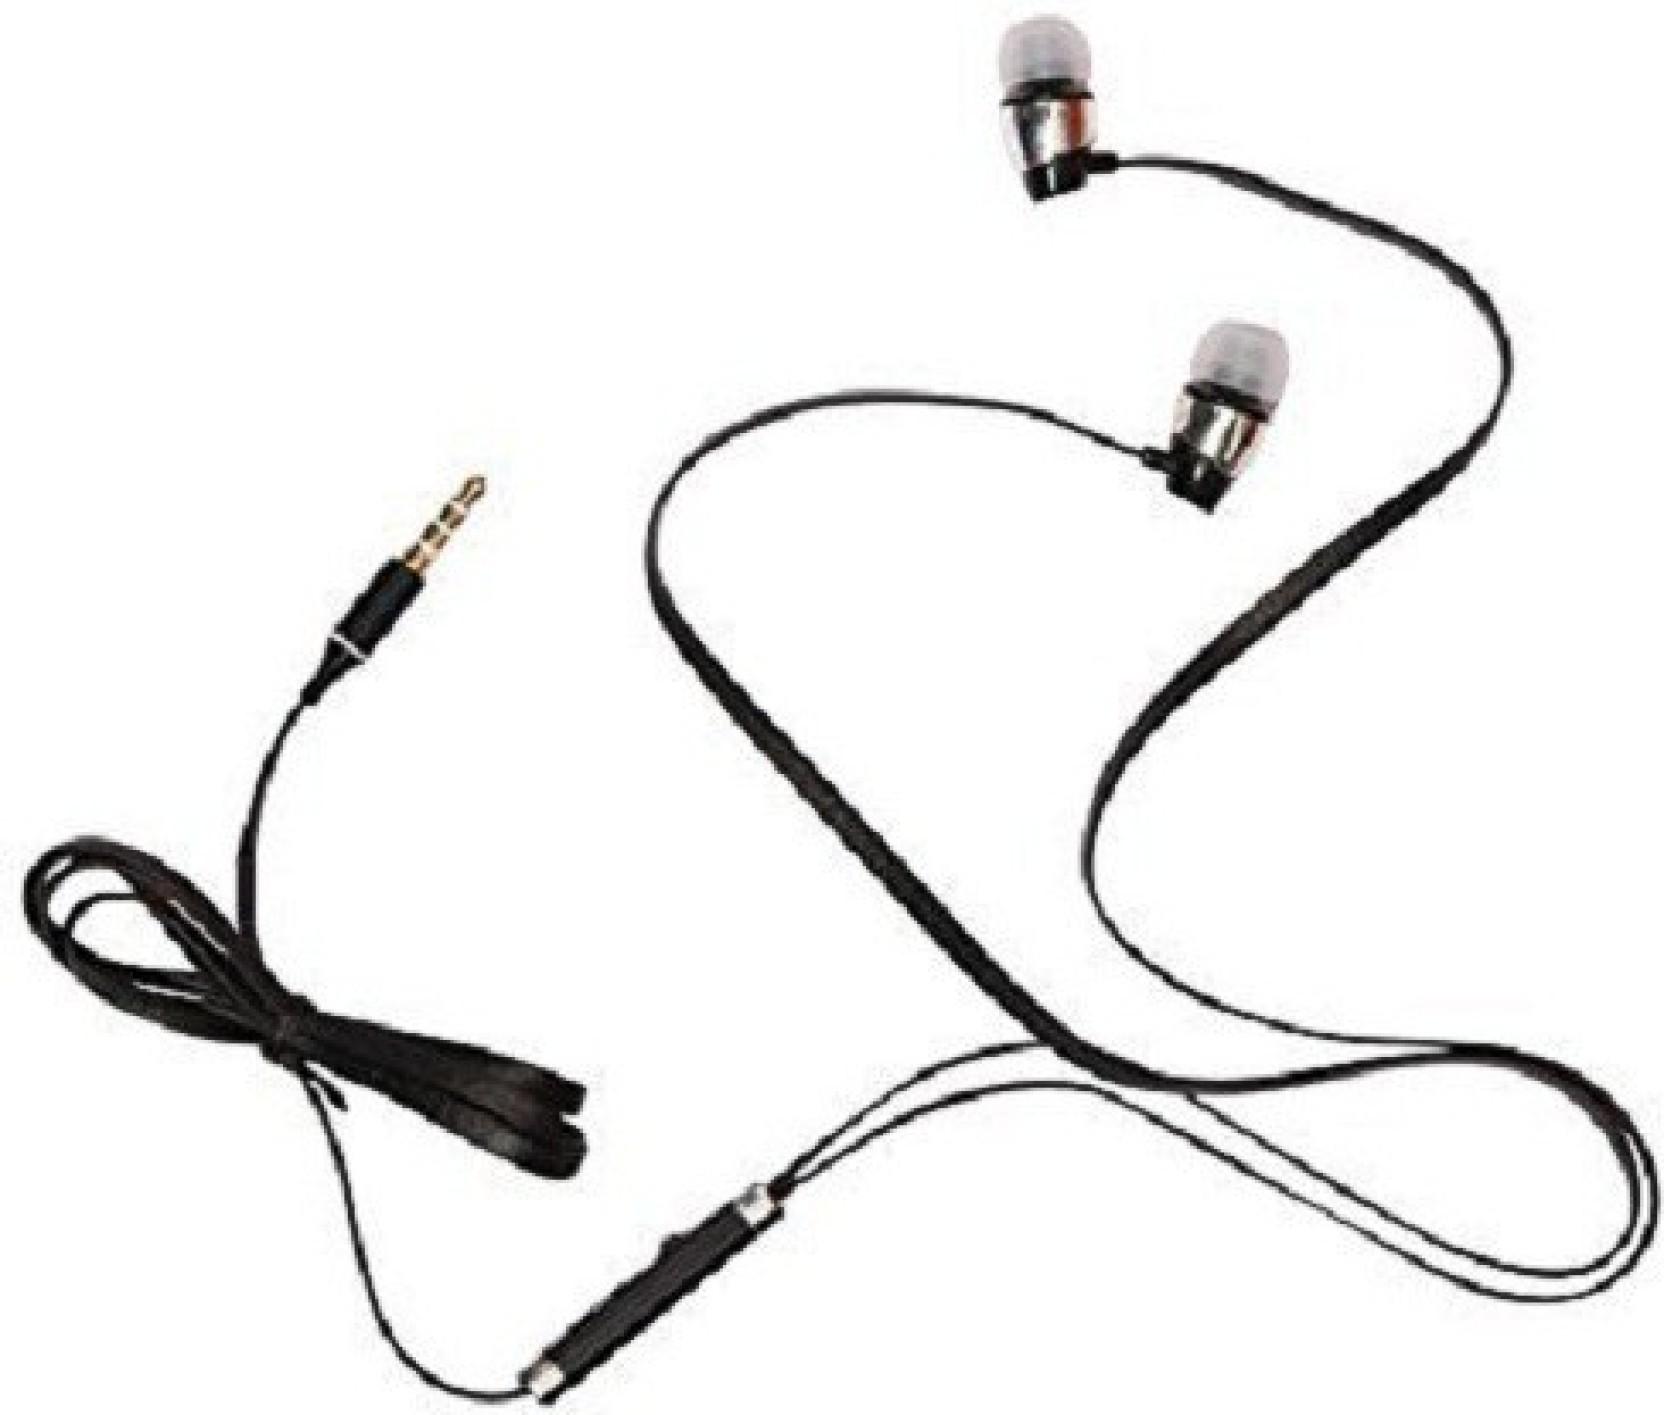 online shopping india buy mobiles electronics appliances Money Audio jiyanshi dummy migration 49 headphone black in the ear